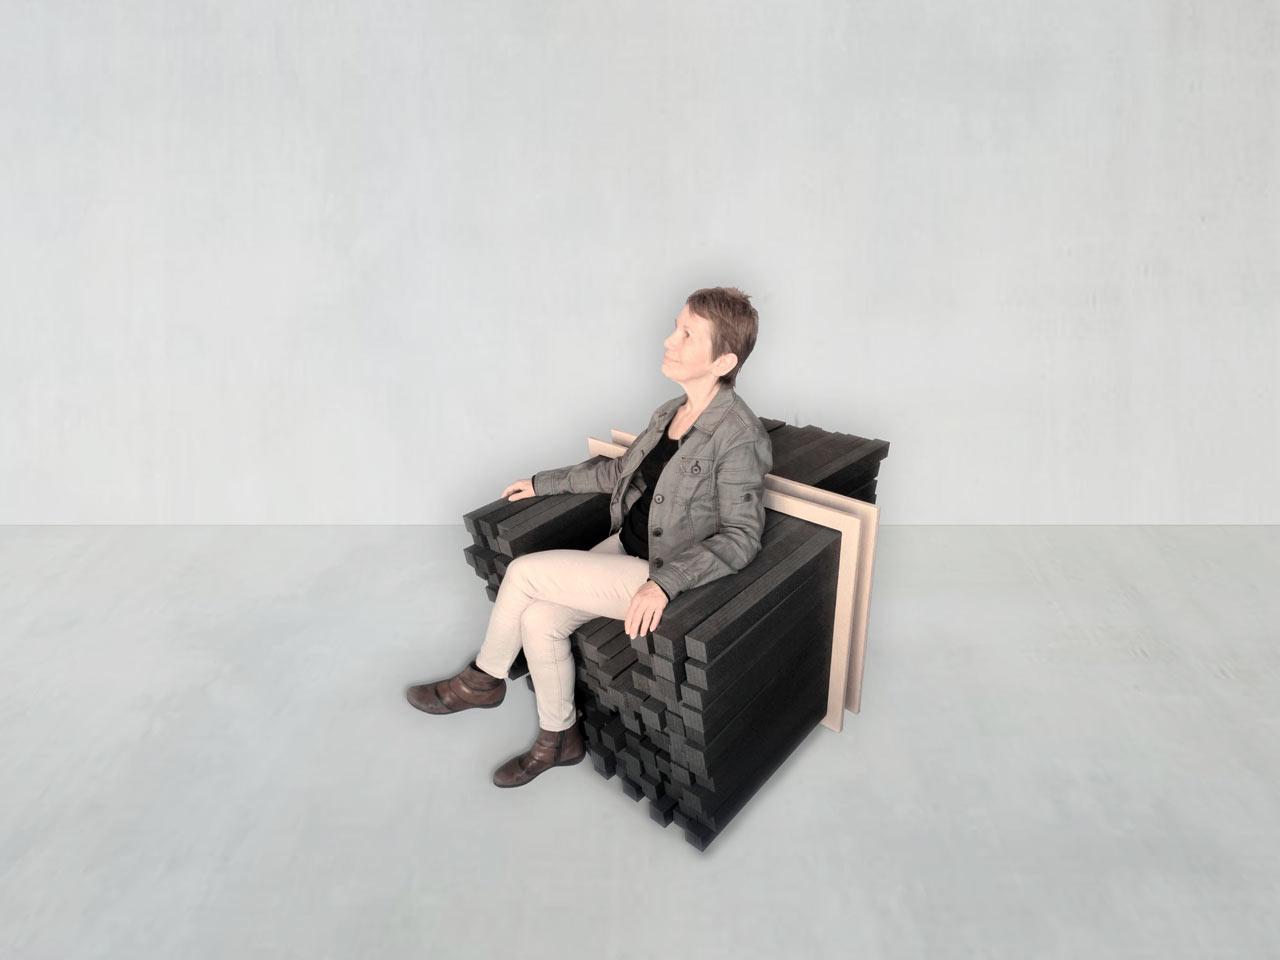 Keren_Shiker-Sink_In-Adjustable-Seating-hisheji (8)